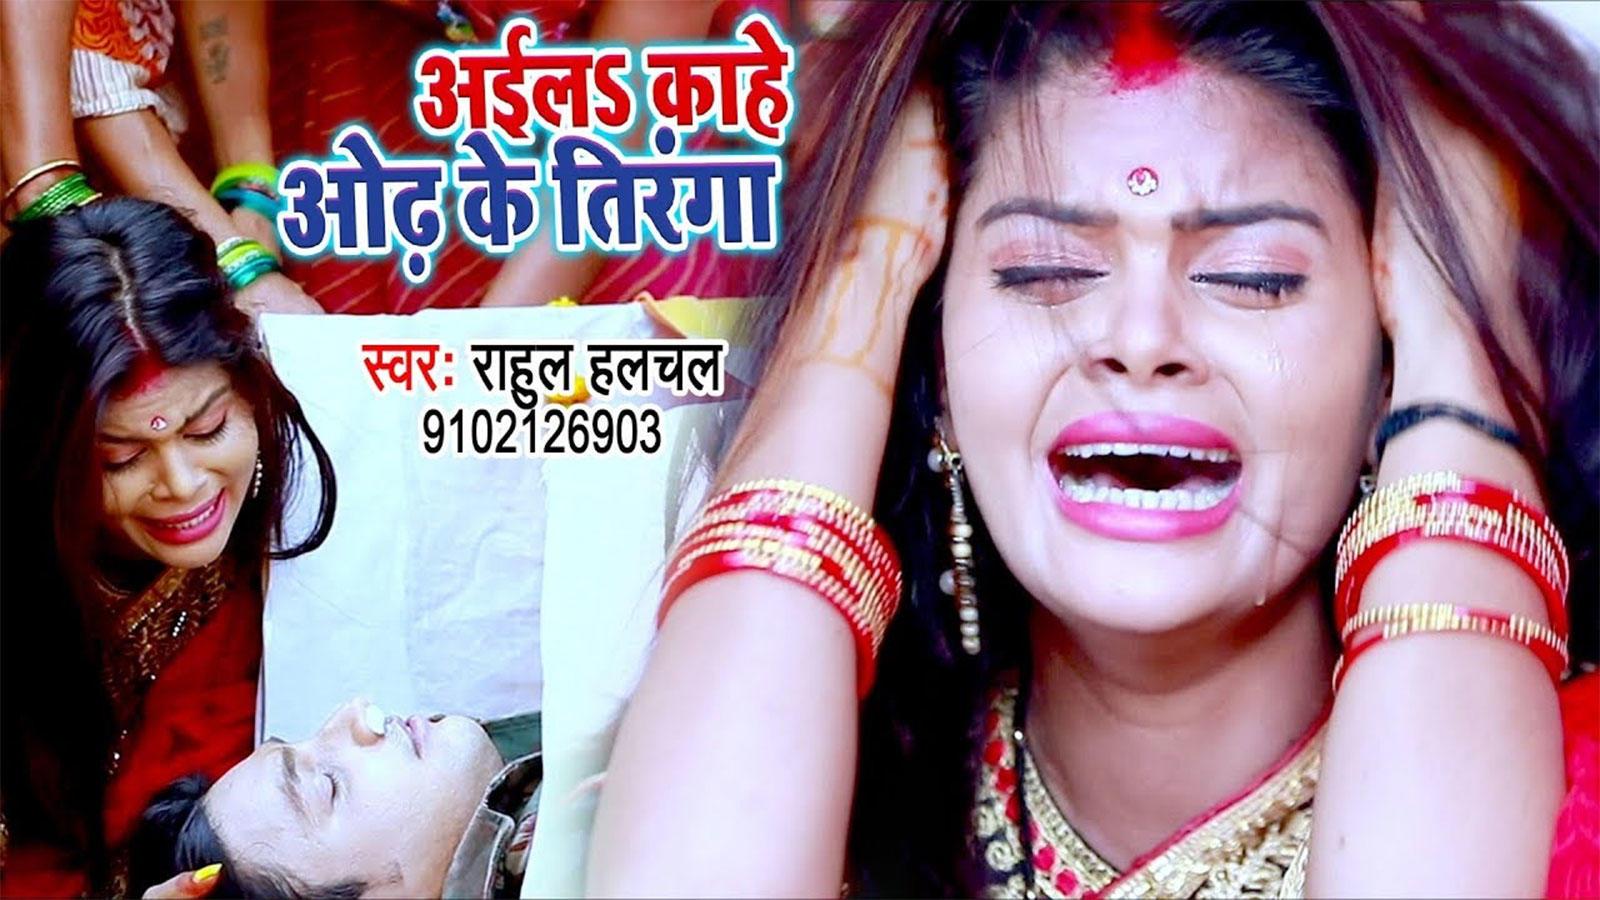 Latest Bhojpuri Song 'Aaila Kahe Odh Ke Tiranga' Sung By Rahul